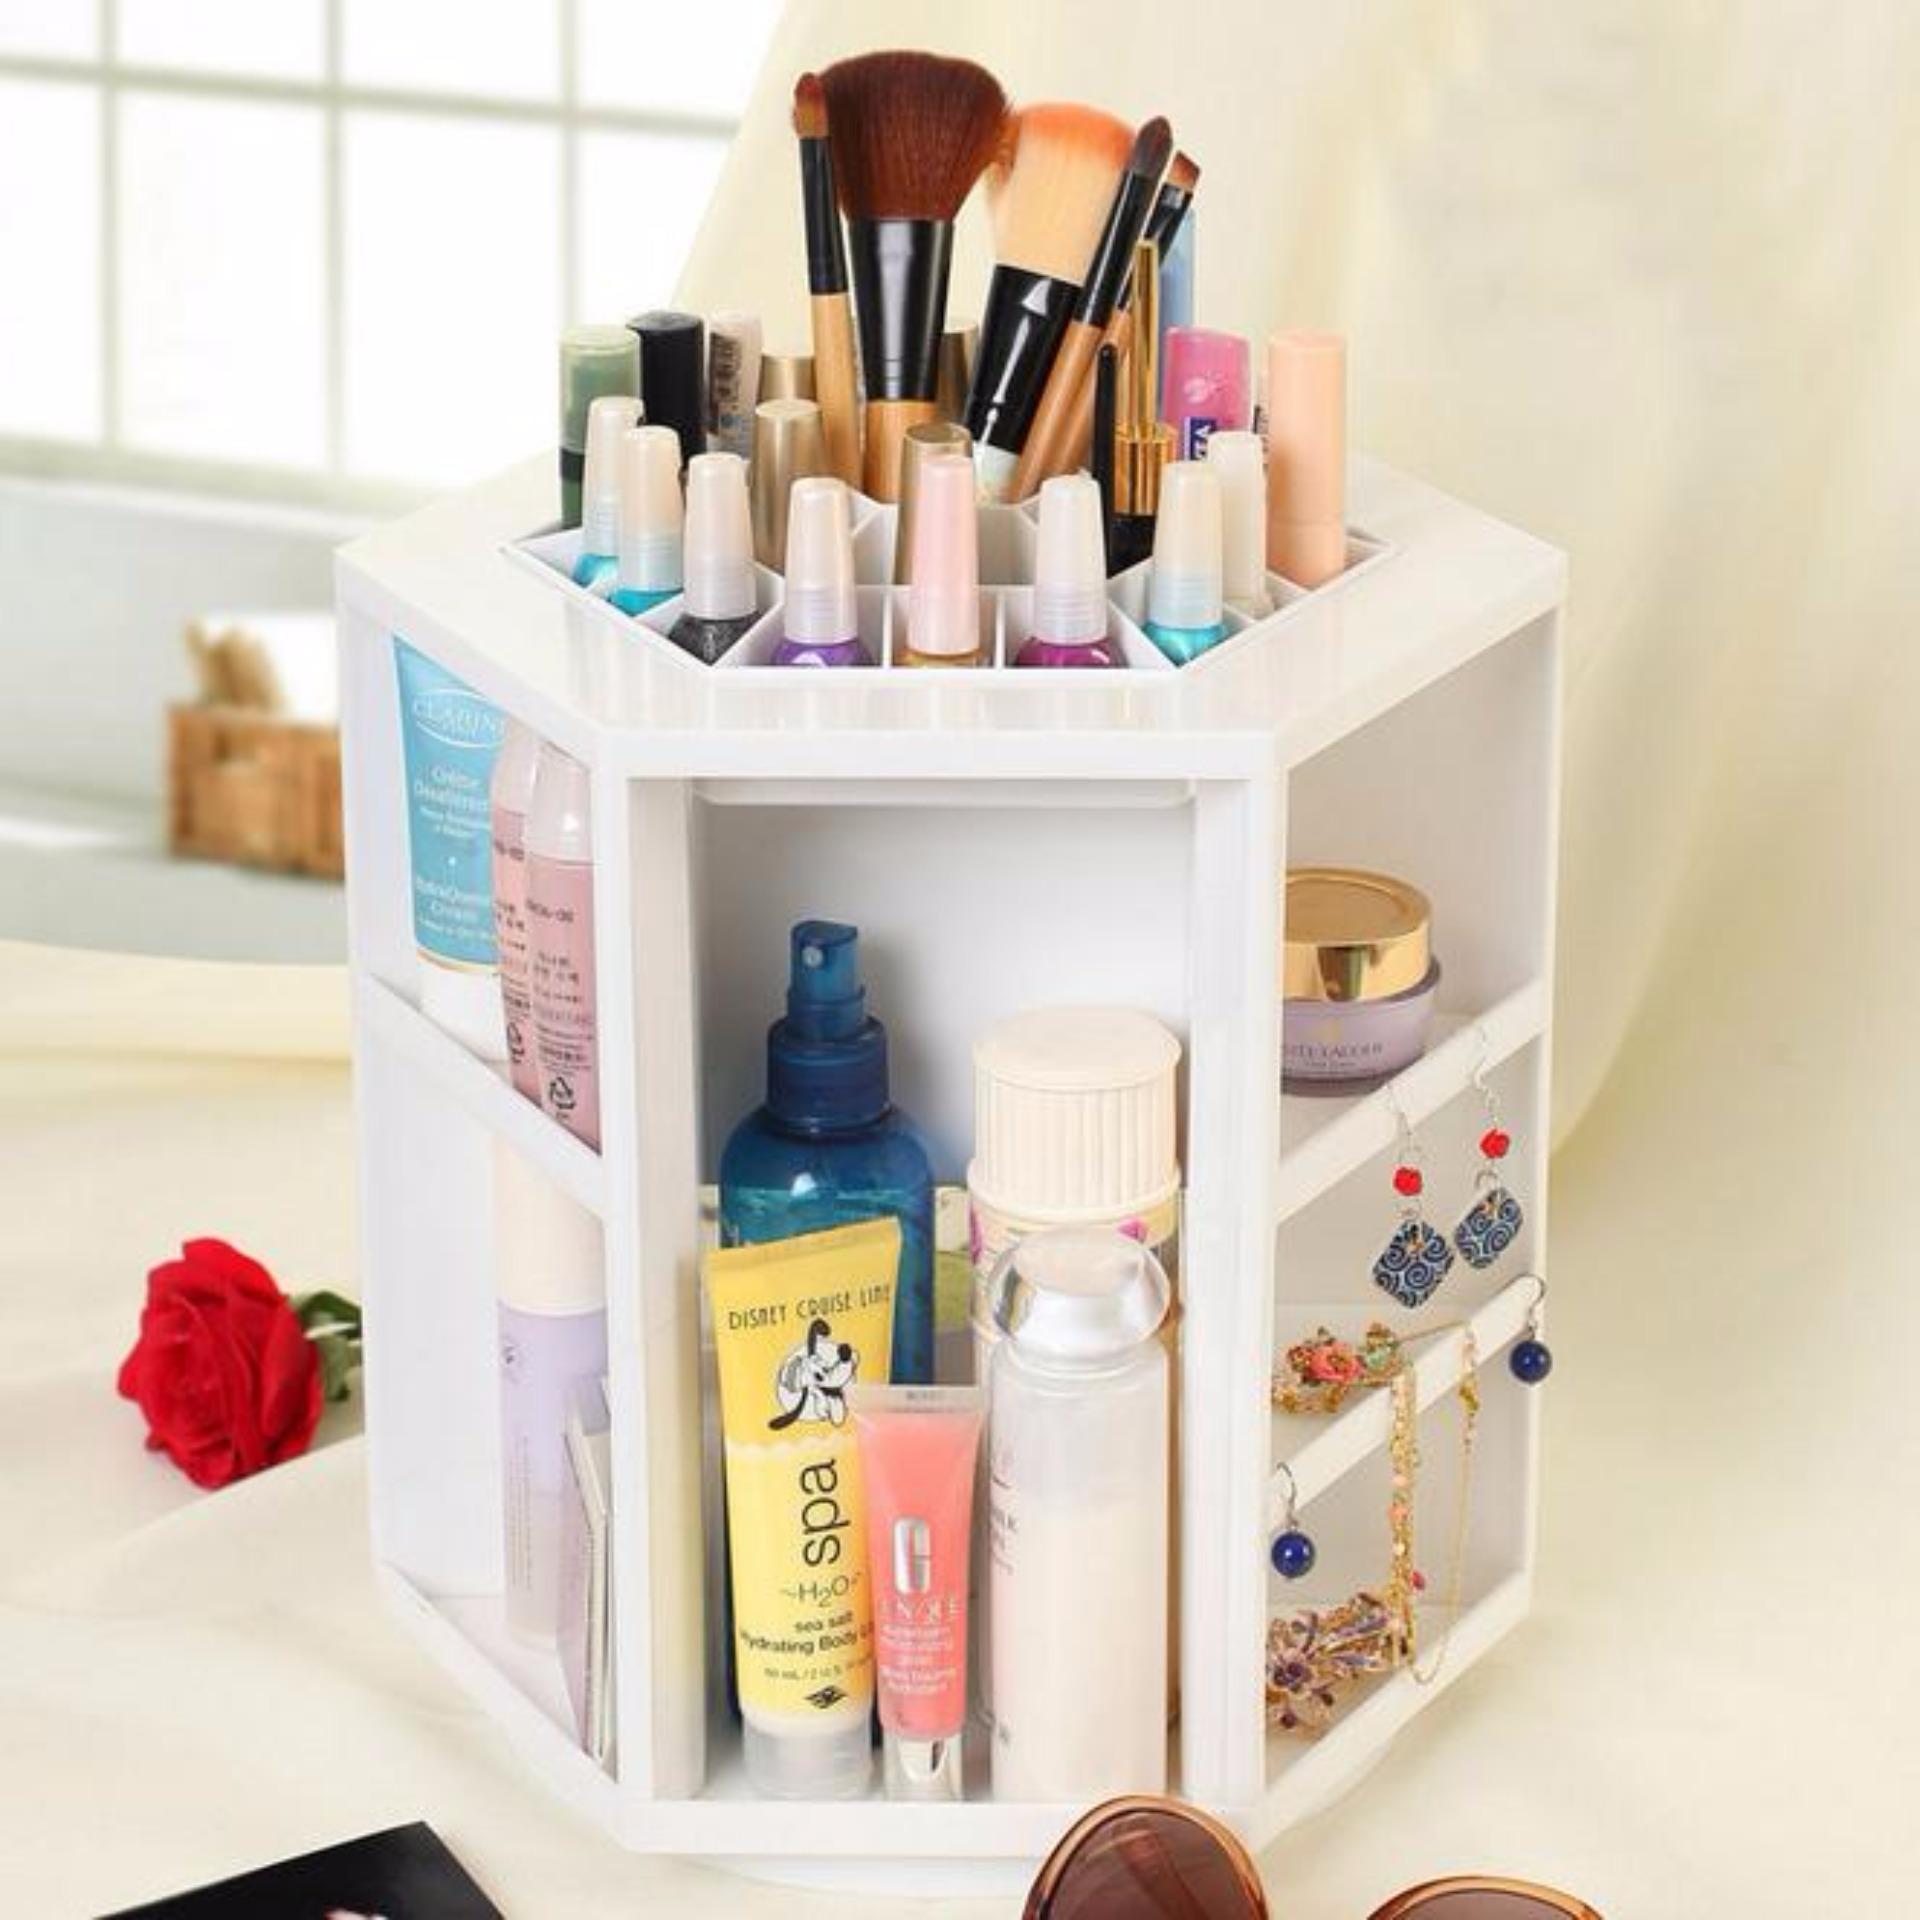 Babamu Tempat Kosmetik Storage Rack Cosmetic White Daftar Harga Desktop Rotate Kotak Kuas Make Up Kutek Rak Cosmetics Box Organizer 360 Rotating Putar360